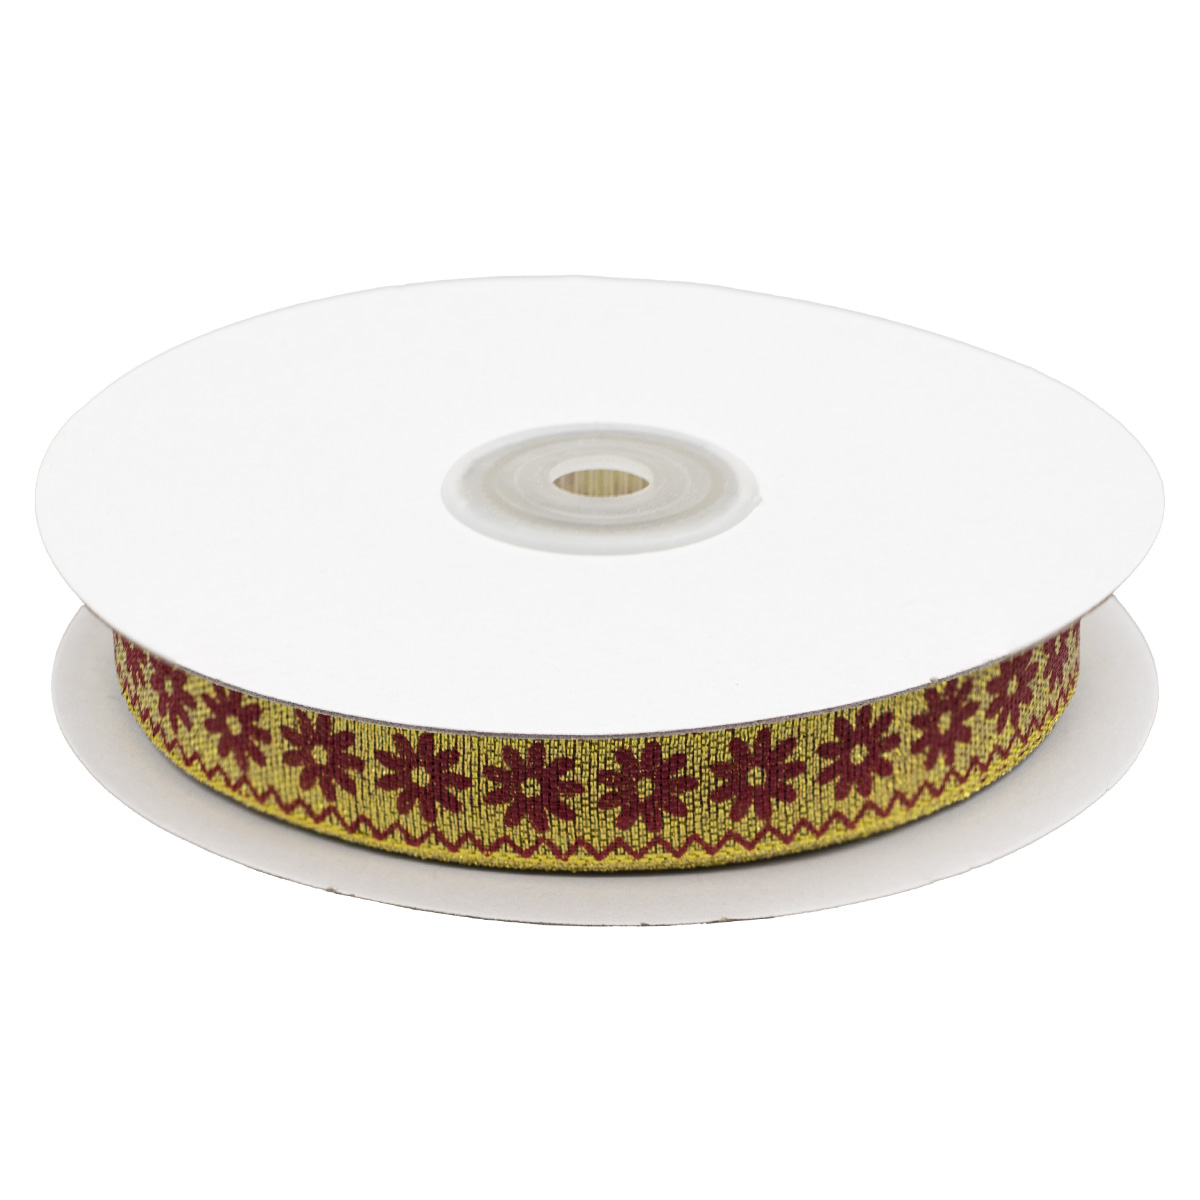 Декоративная лента'Ромашки', DM-012, 15 мм*32,9м золото/красный